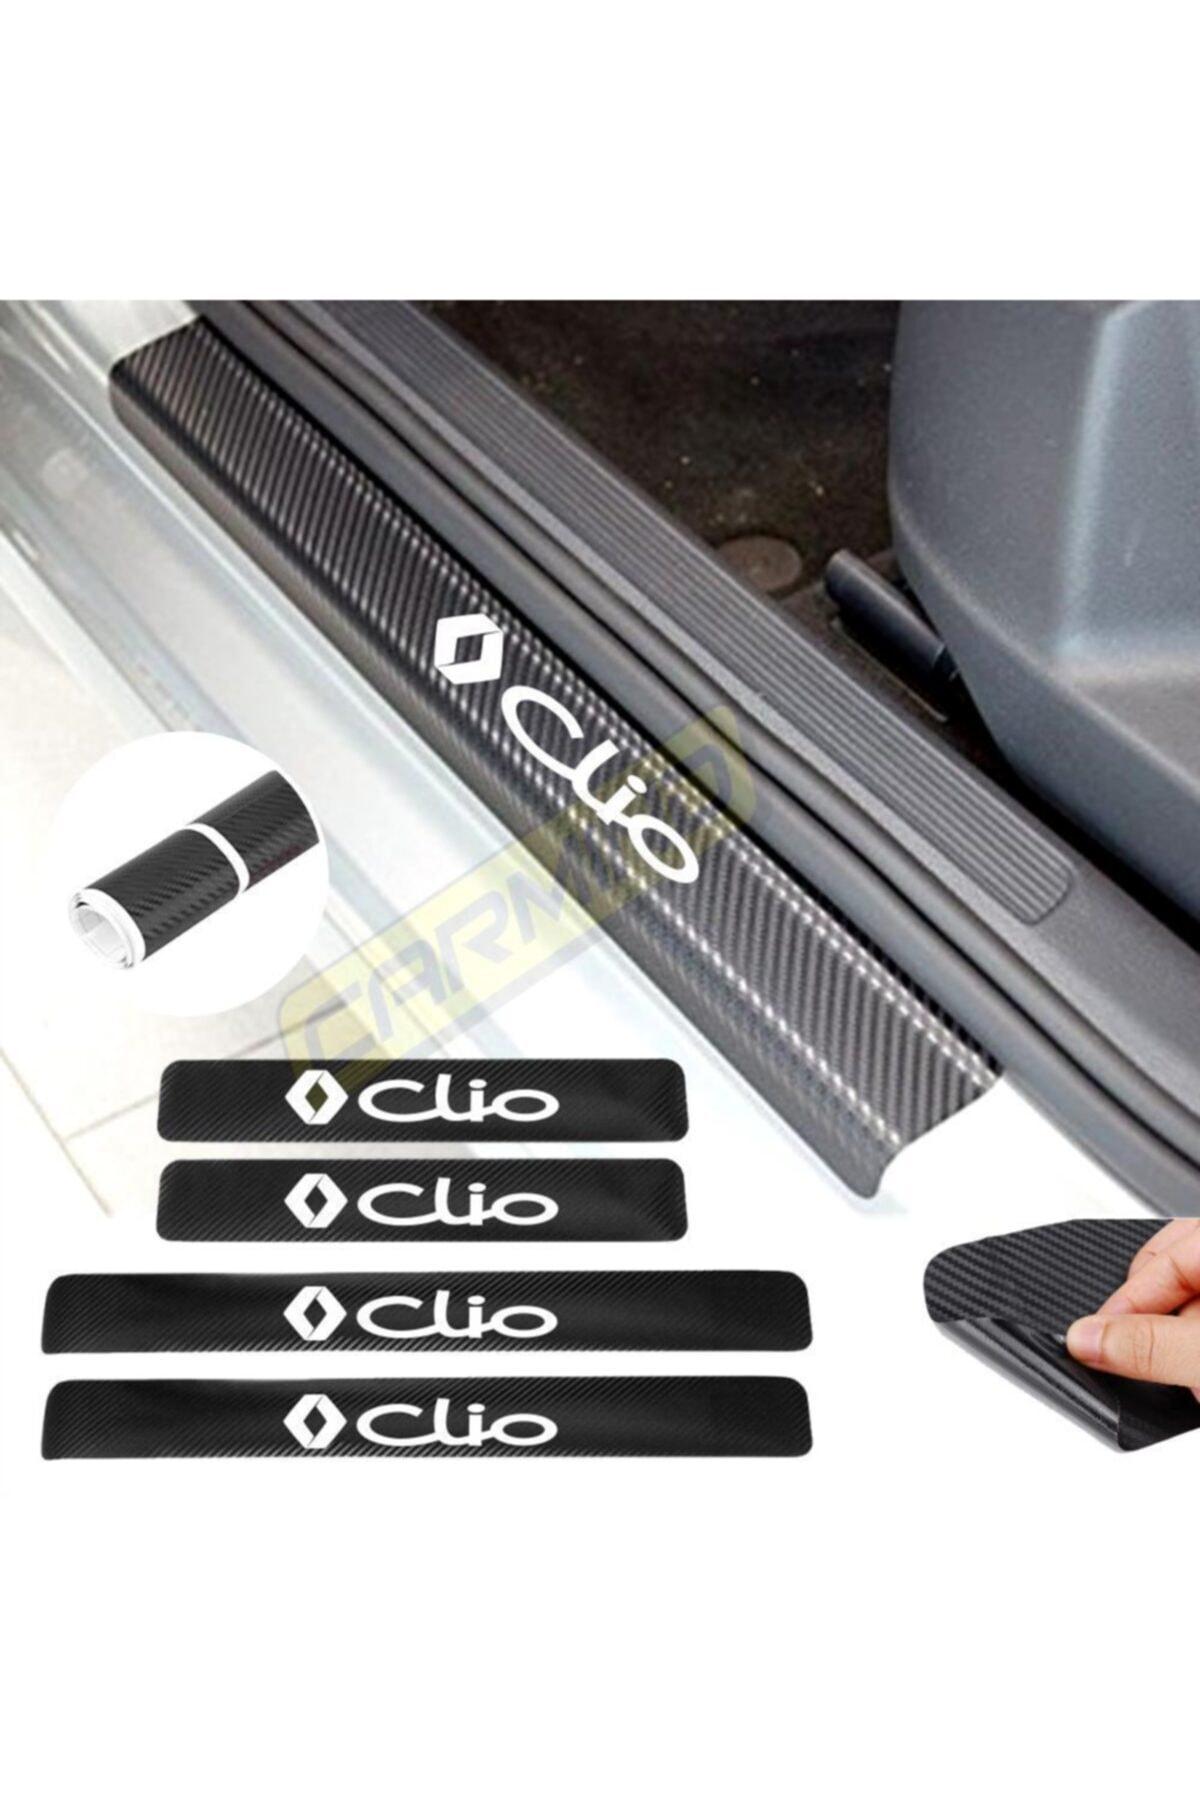 Renault Clio Karbon Kapı Eşiği Sticker 4 Adet